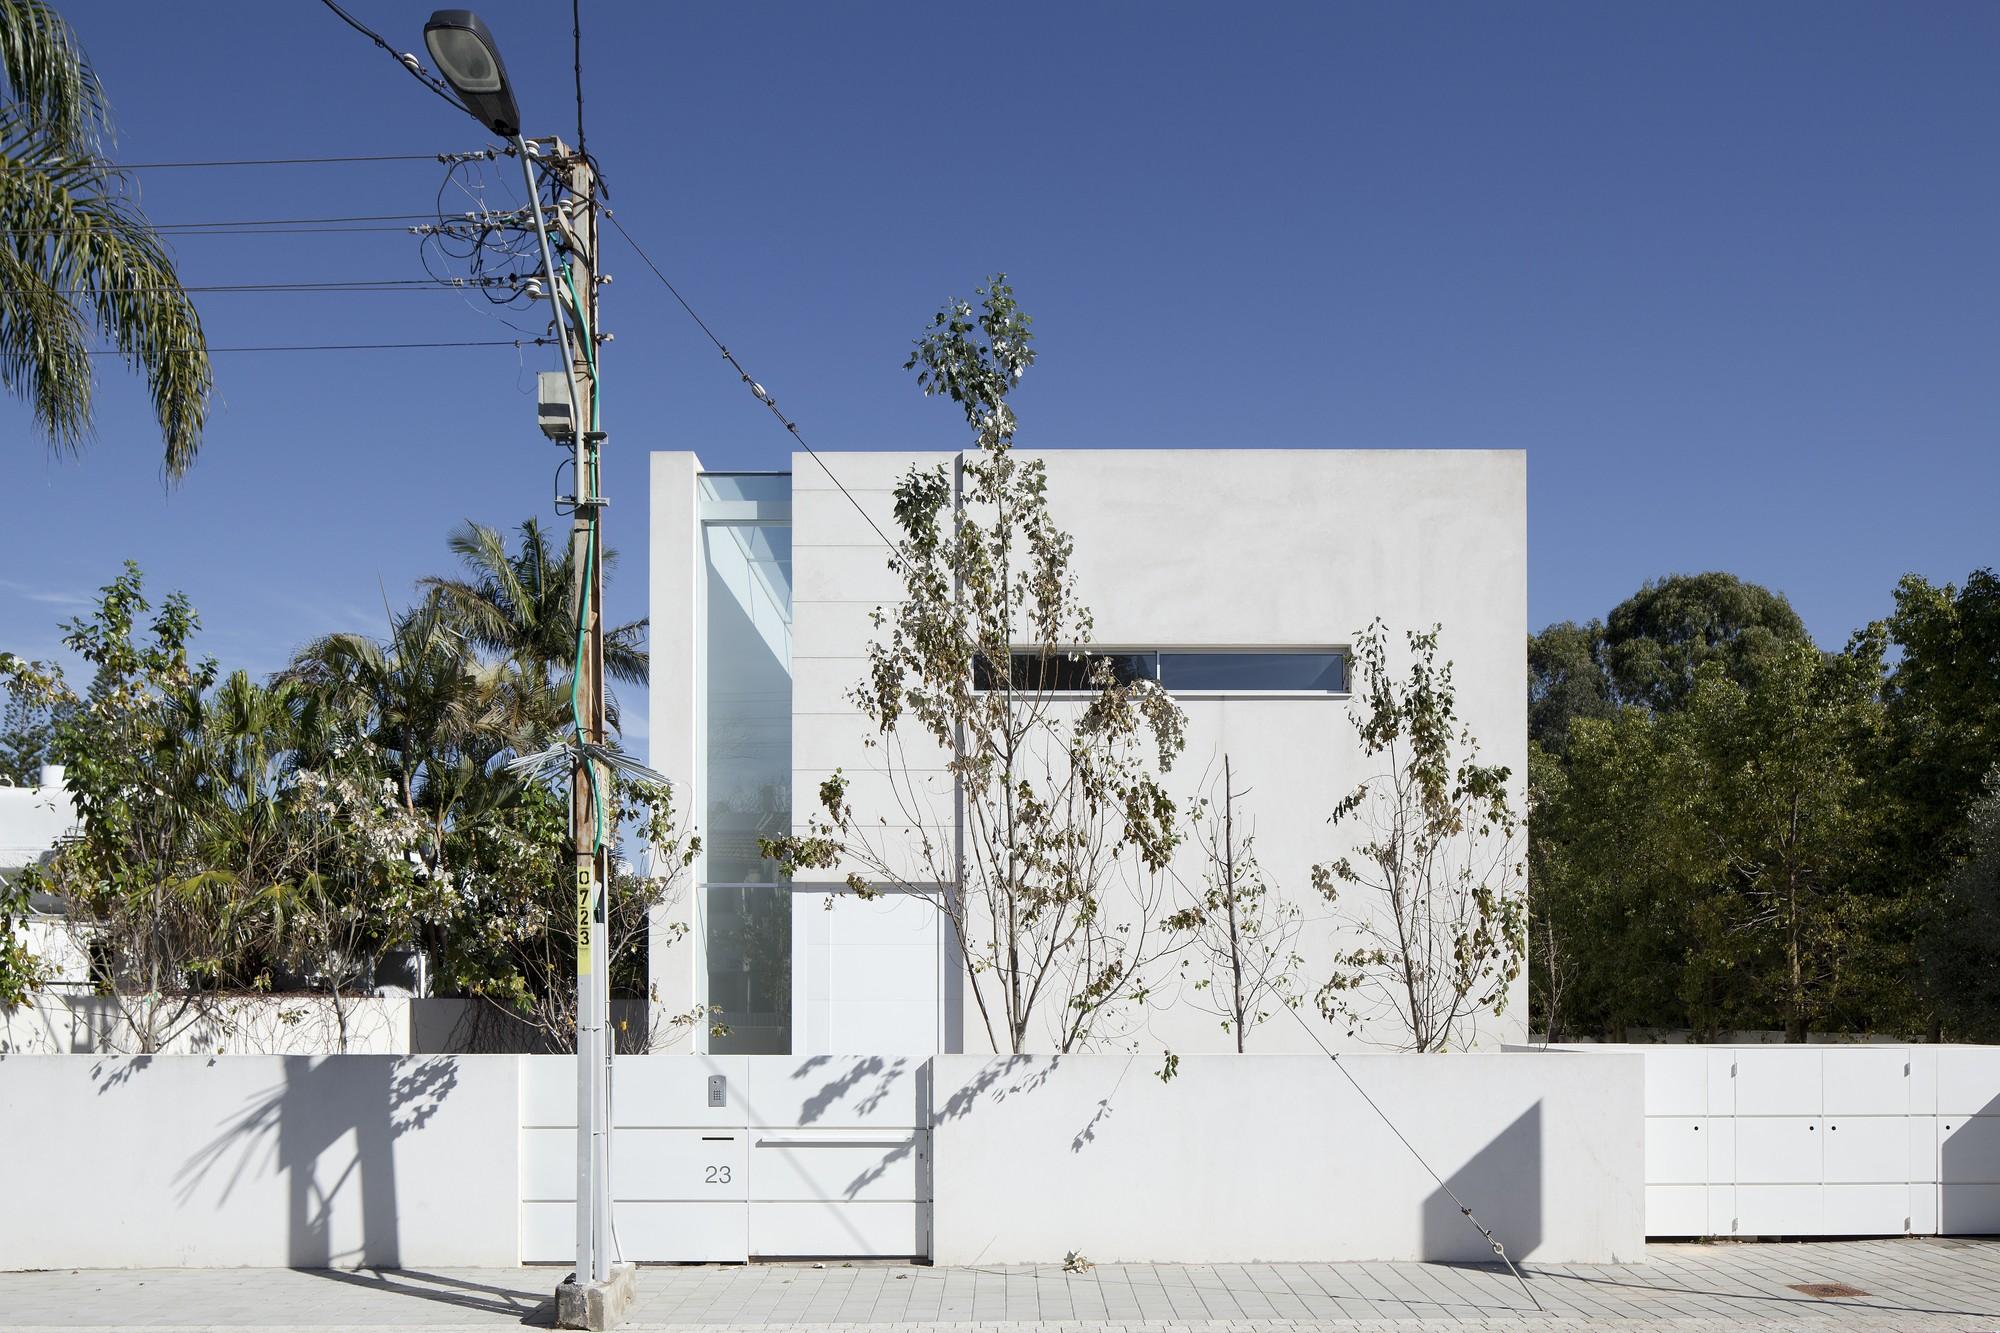 G House / Axelrod Architects + Pitsou Kedem Architect, © Amit Geron